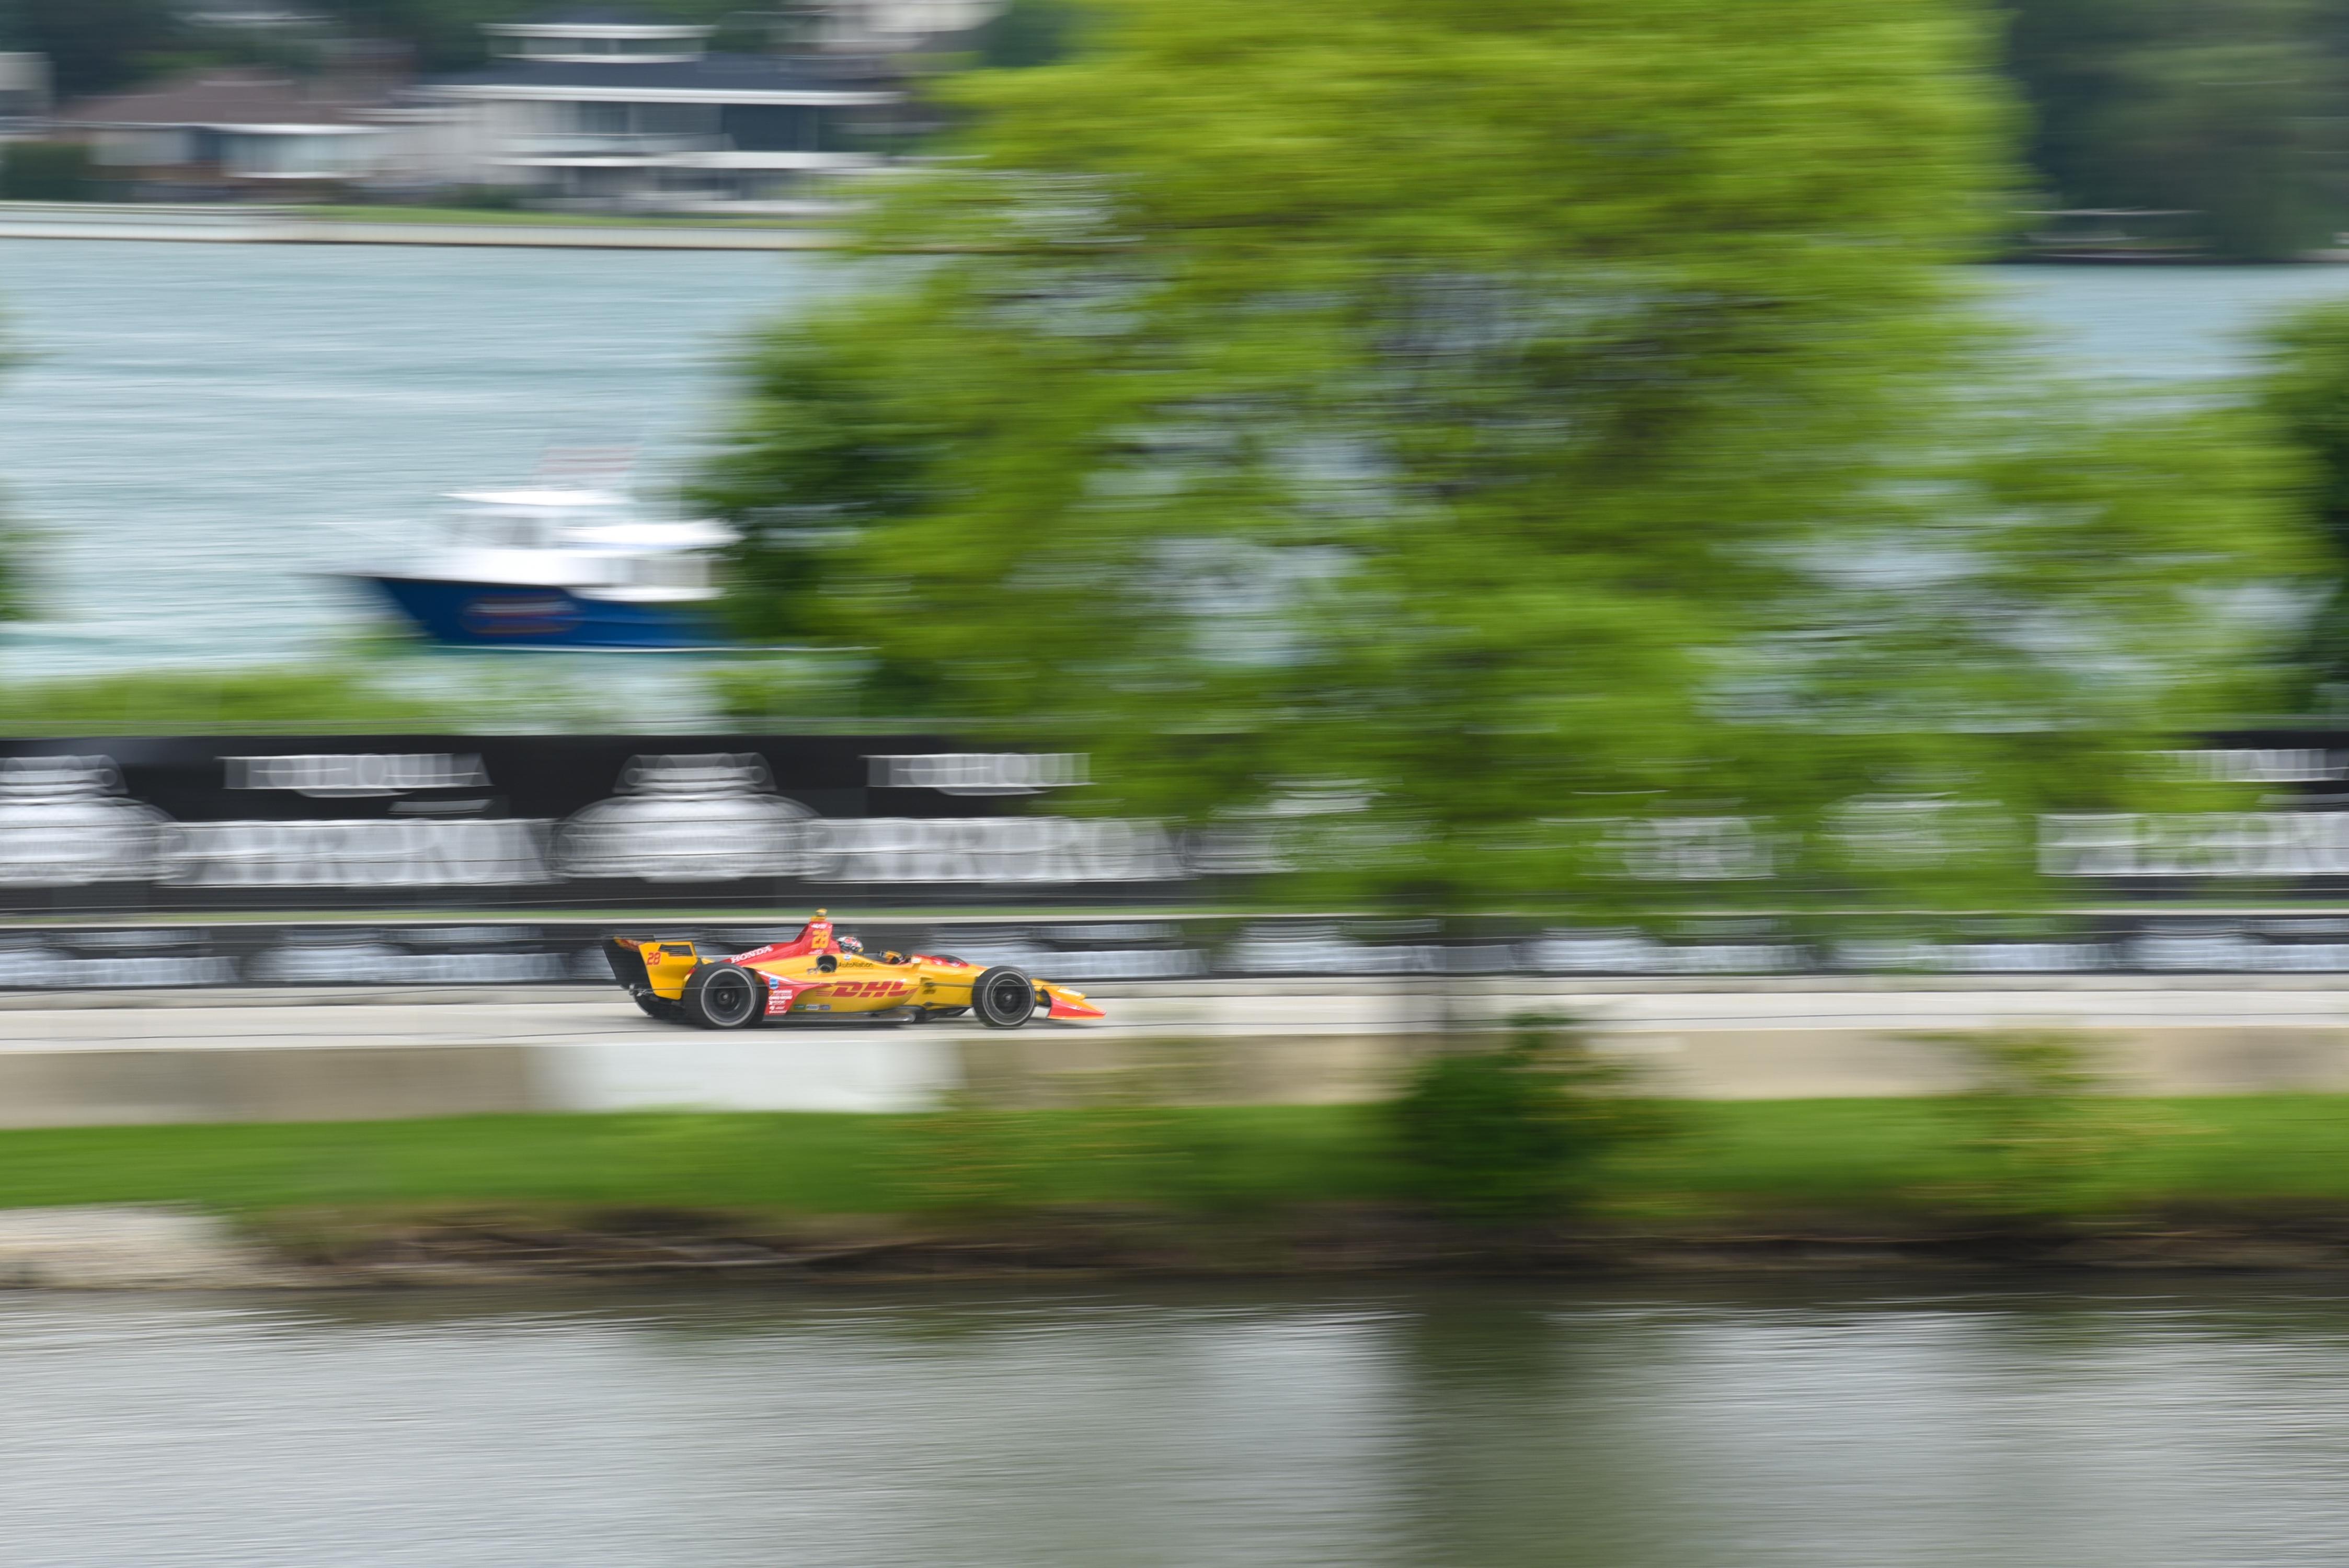 MIdweek Motorsport series 13 episode 22